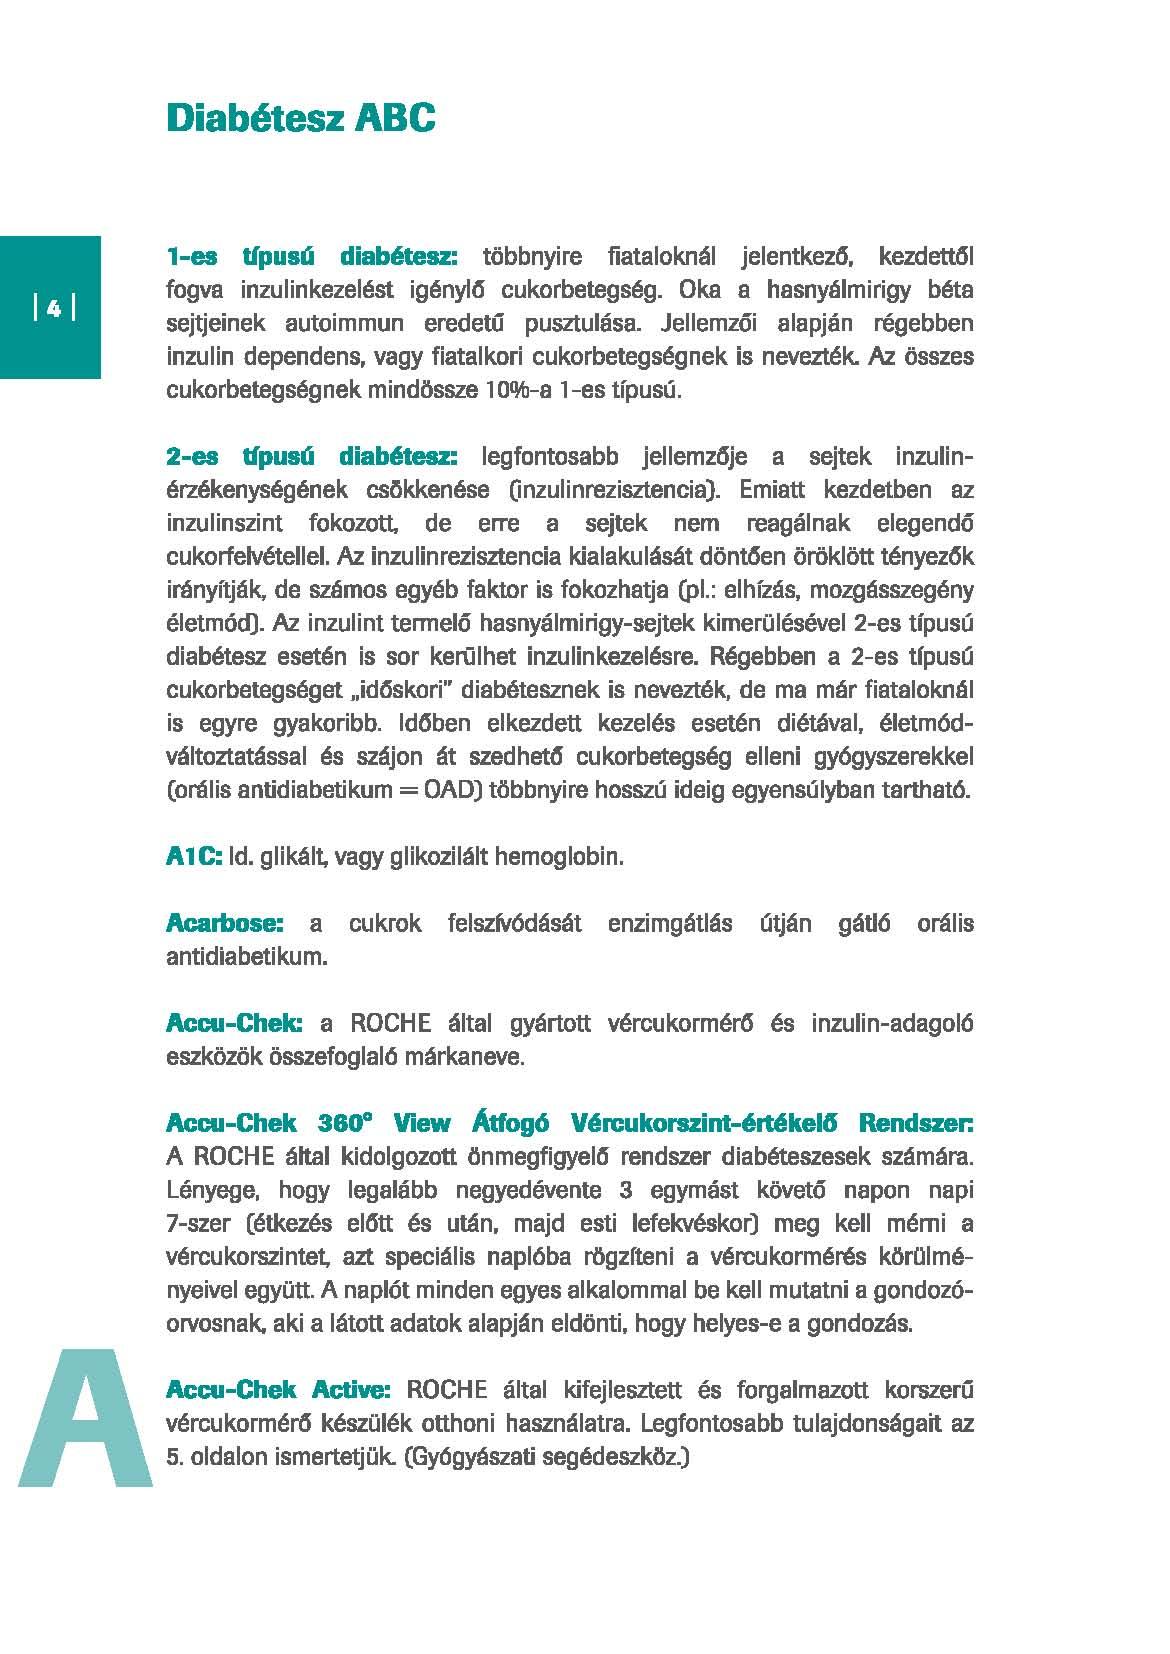 Diabétesz ABC - A5_14-proof_Page_04